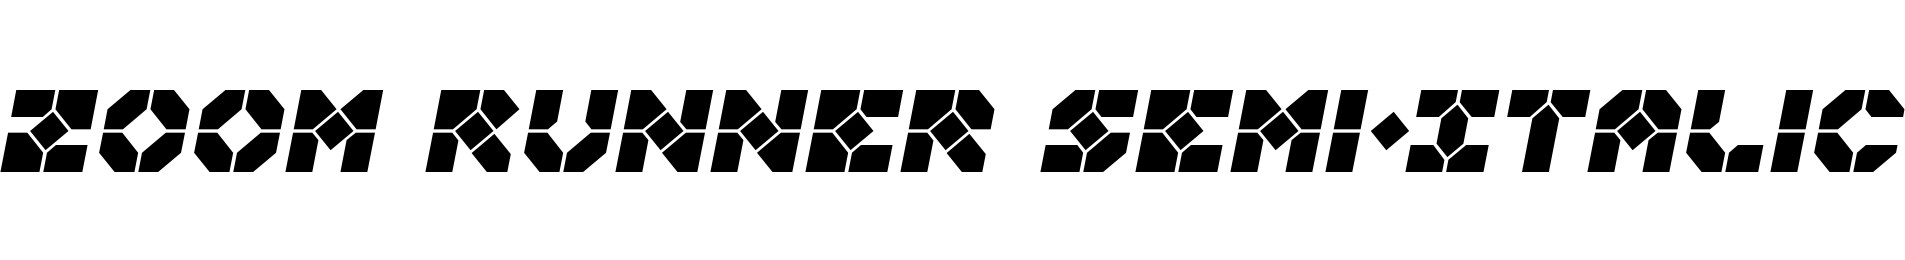 Zoom Runner Semi-Italic